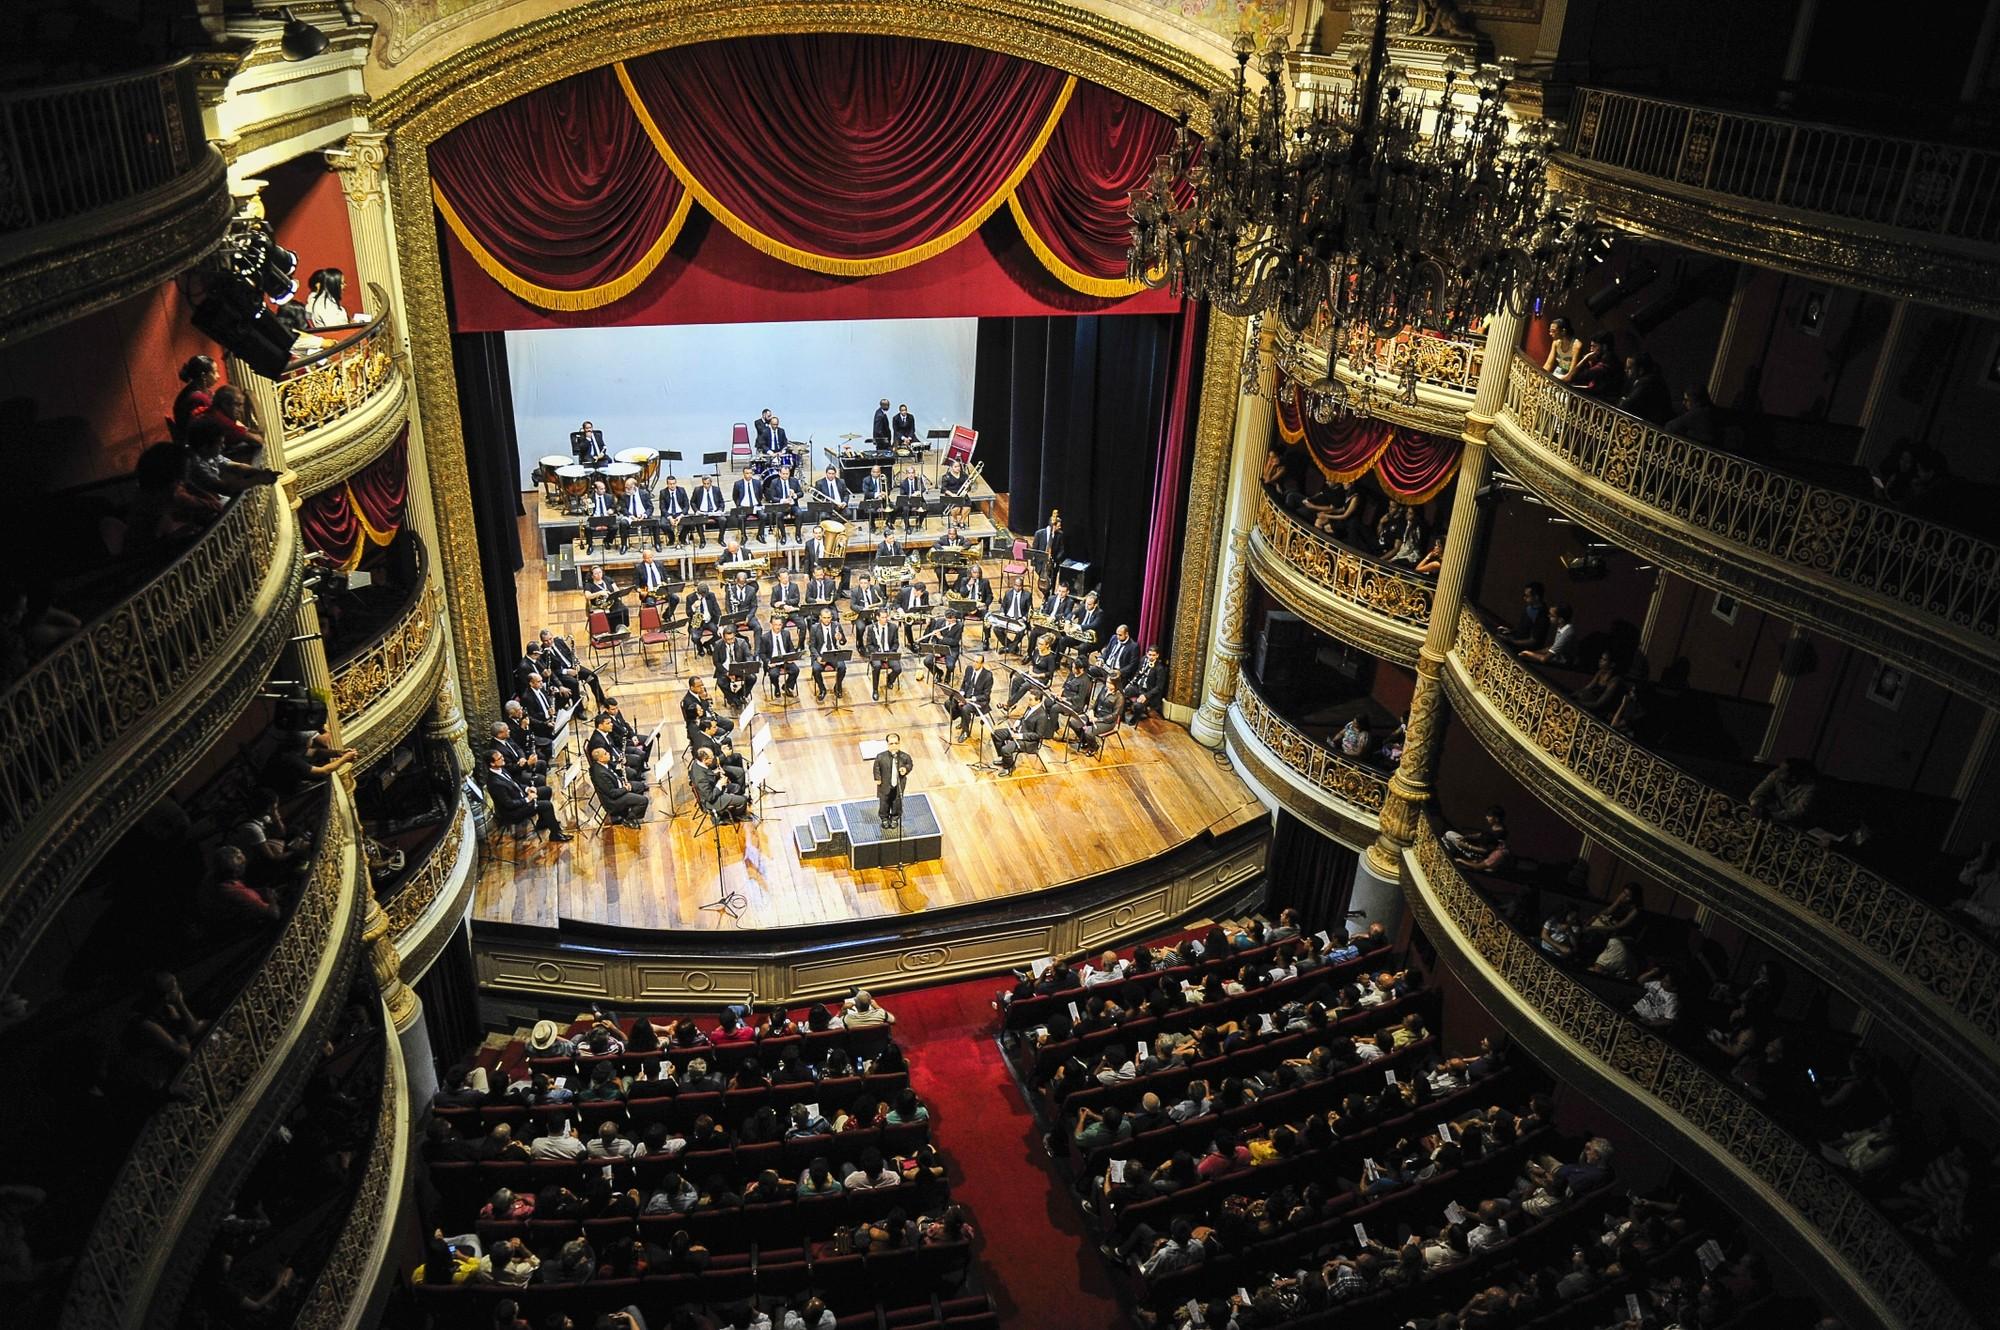 Banda Sinfônica do Recife faz dois concertos no Teatro de Santa Isabel